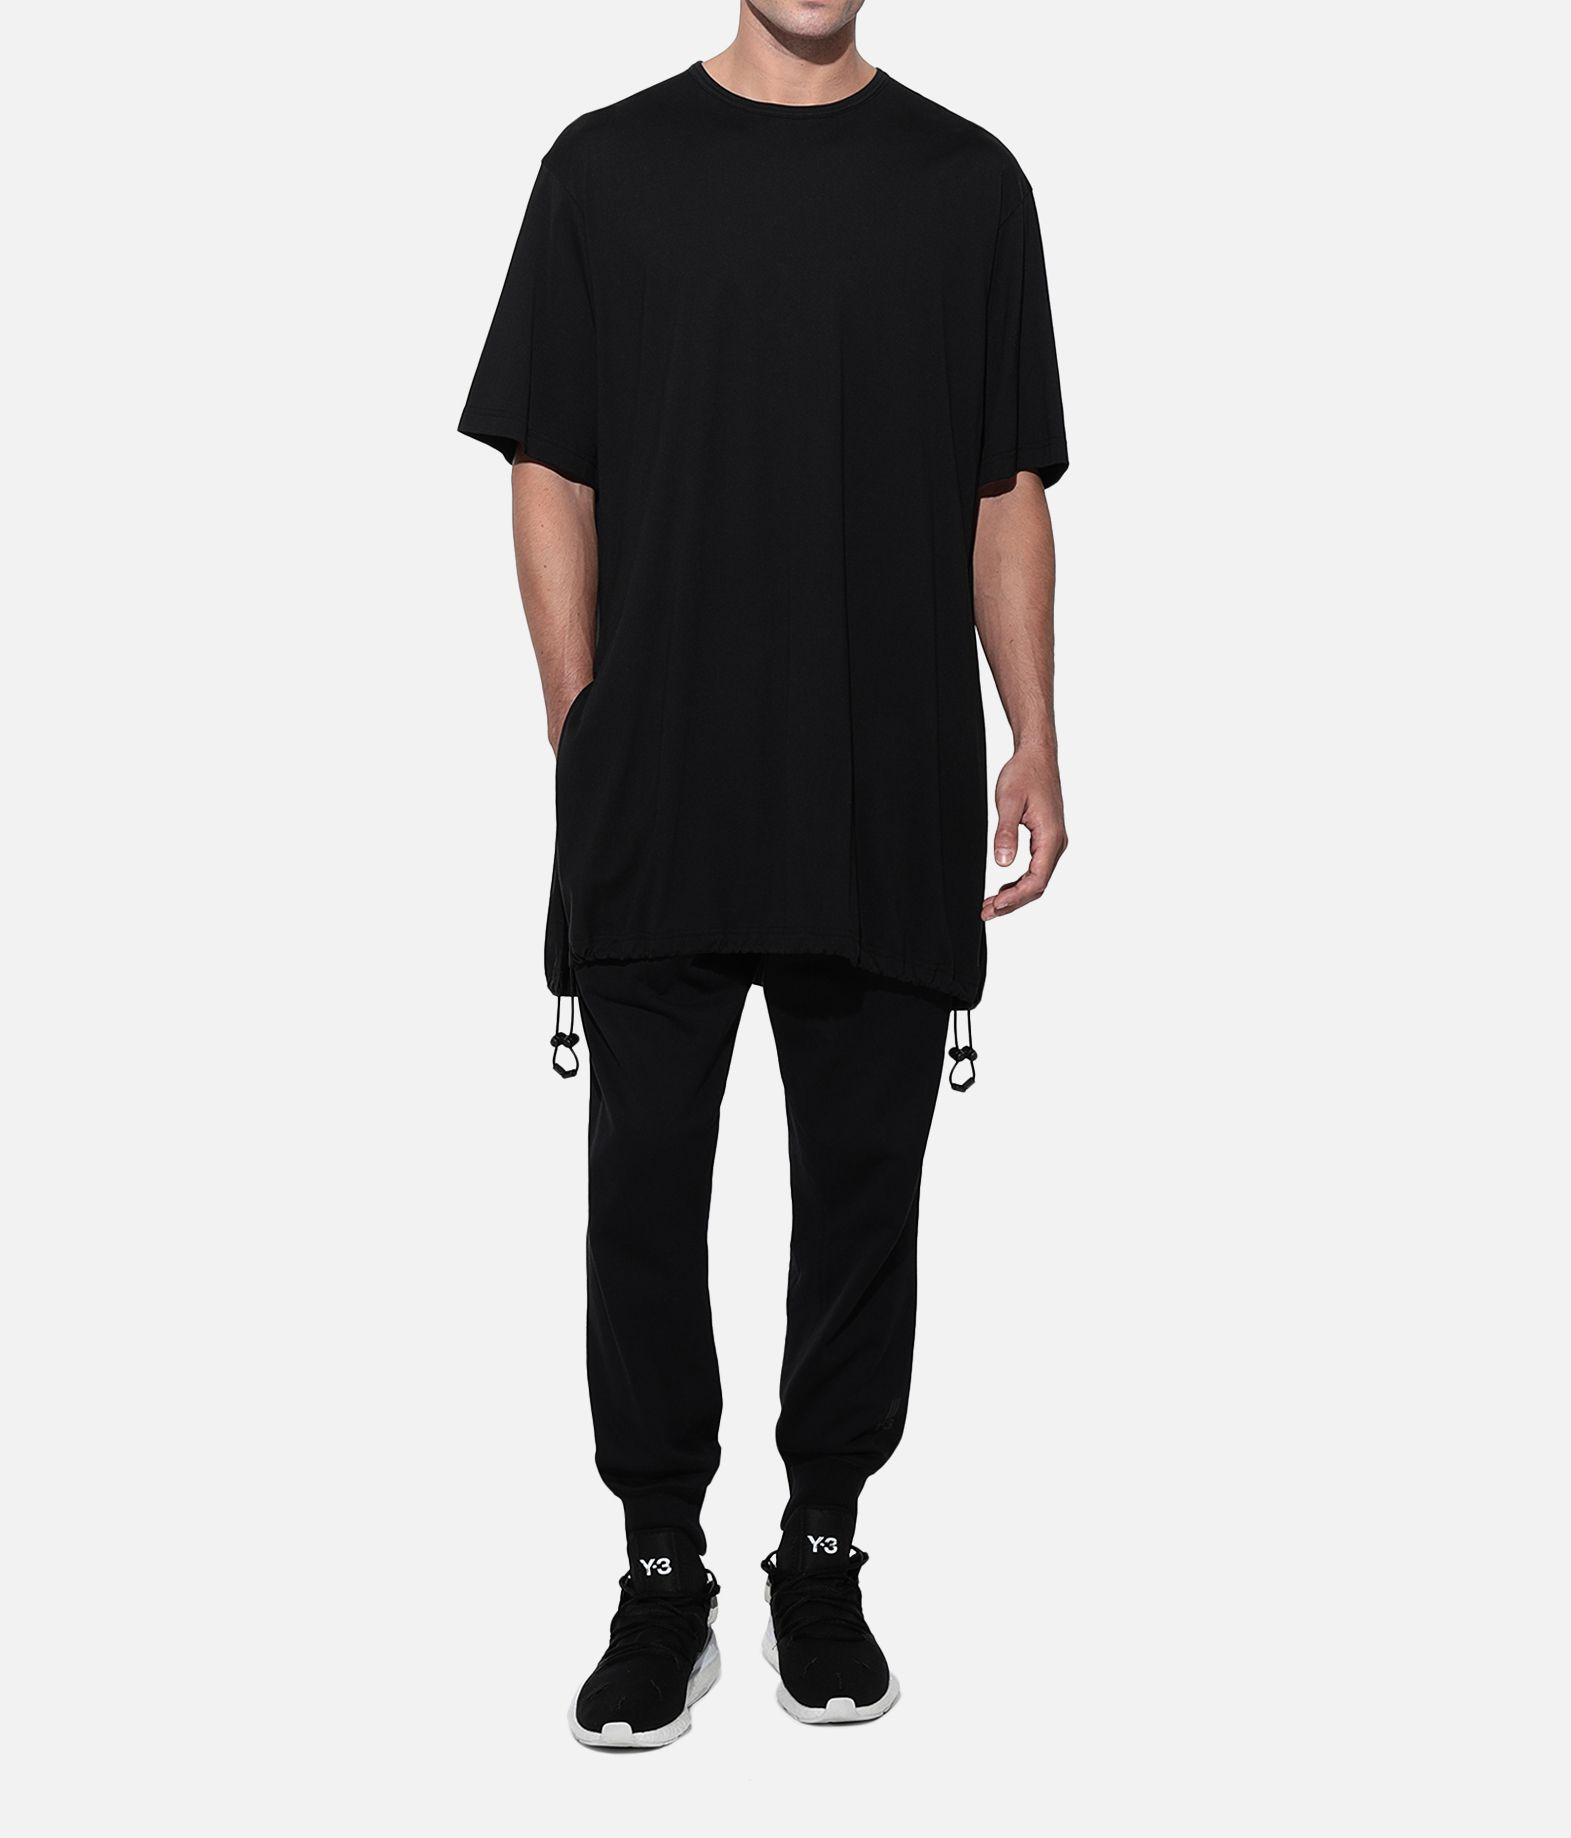 Y-3 Y-3 Drawstring Long Tee  Kurzärmliges T-shirt Herren a